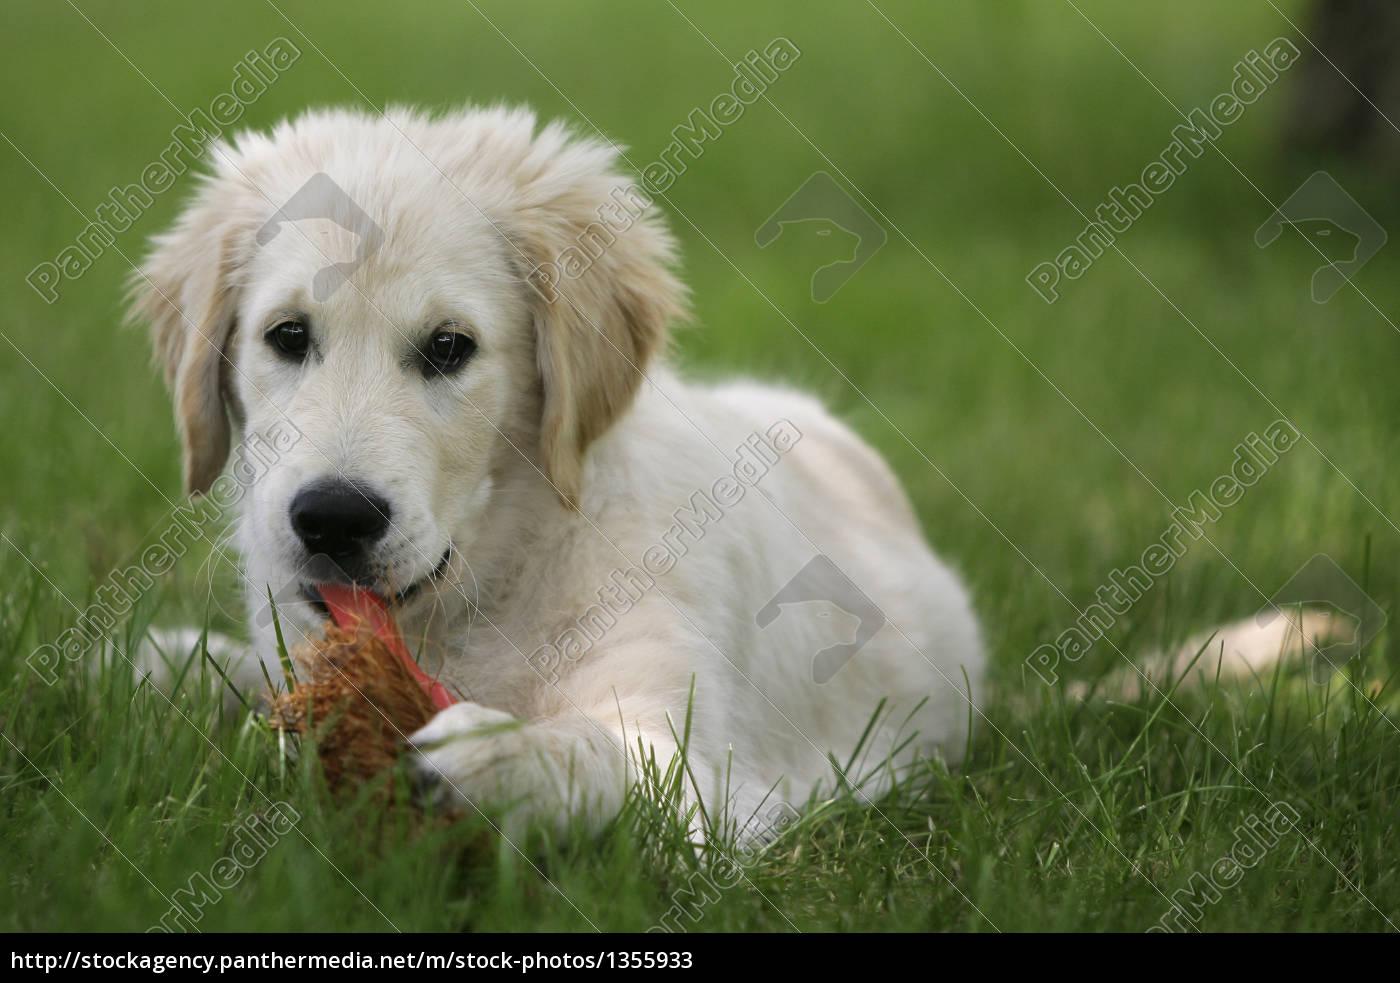 Golden Retriever Puppy Stock Photo 1355933 Panthermedia Stock Agency